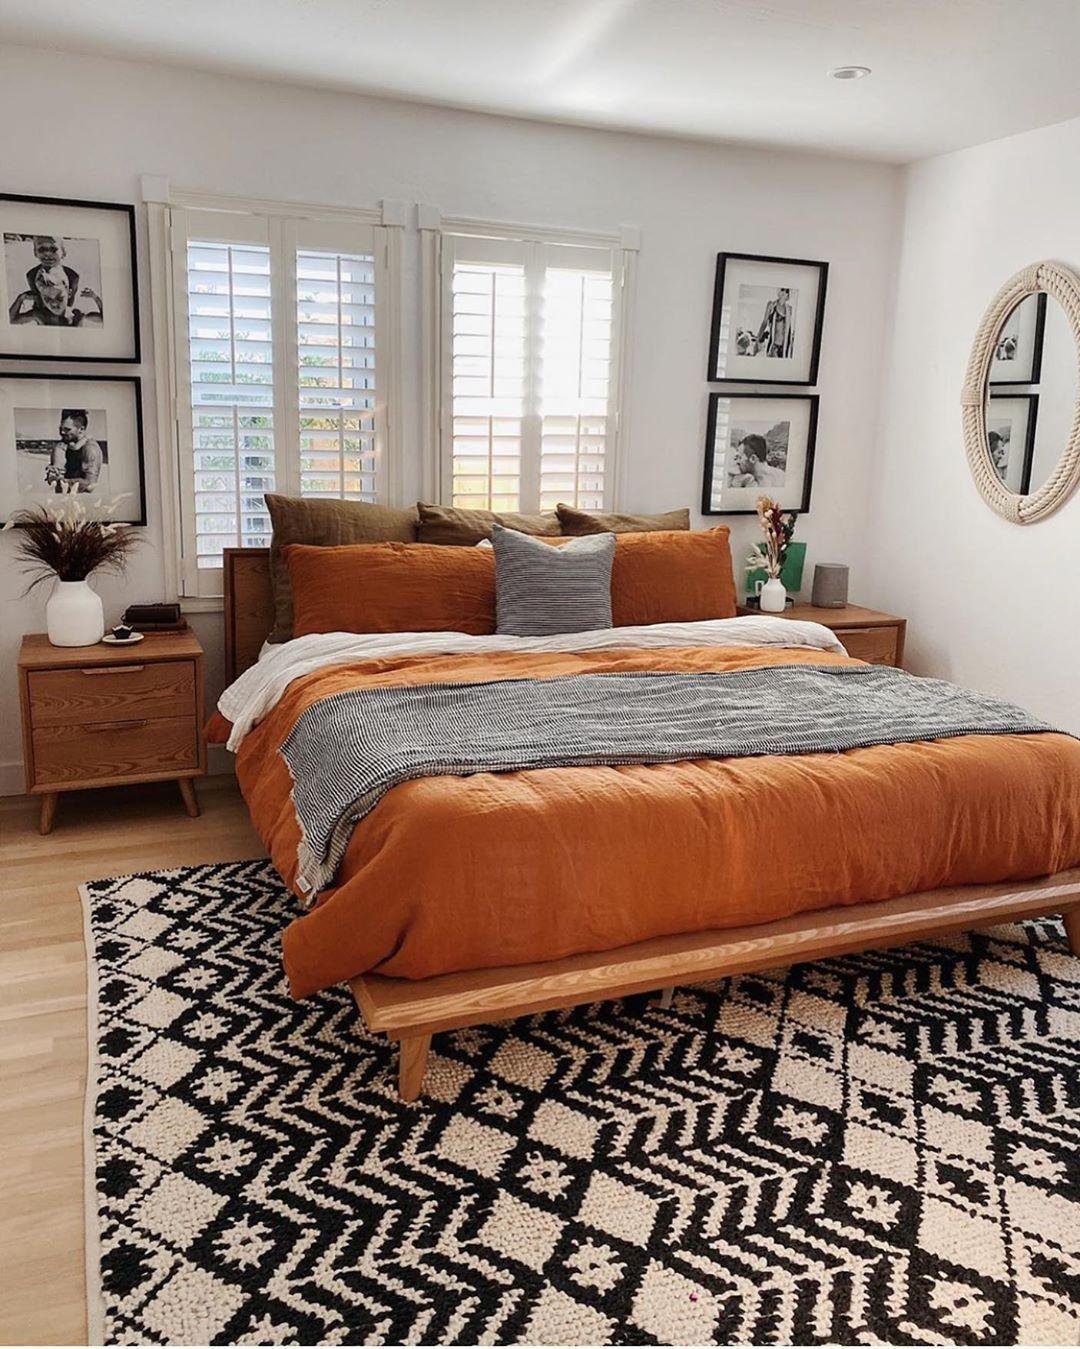 Mid CenturyBohoFarmhouse on Instagram: Pumpkin bed room? Im a fan!  (through @arrowsandbow) ____________________ . . . . . . . . . .  #homeinspo #inspire_me_home_decor #abmathome